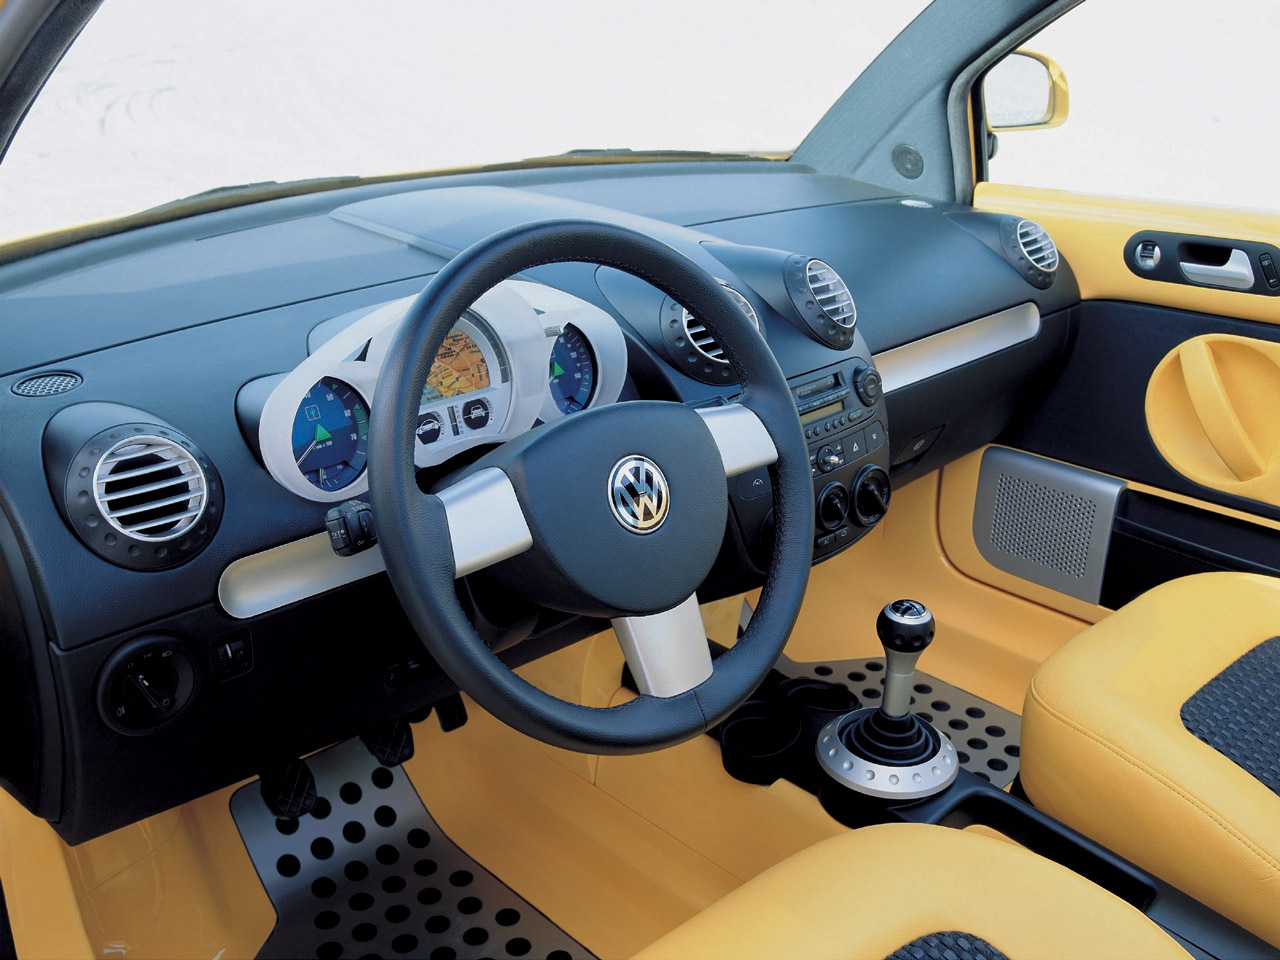 this vw vw new beetle dune interior 1280x960. Black Bedroom Furniture Sets. Home Design Ideas